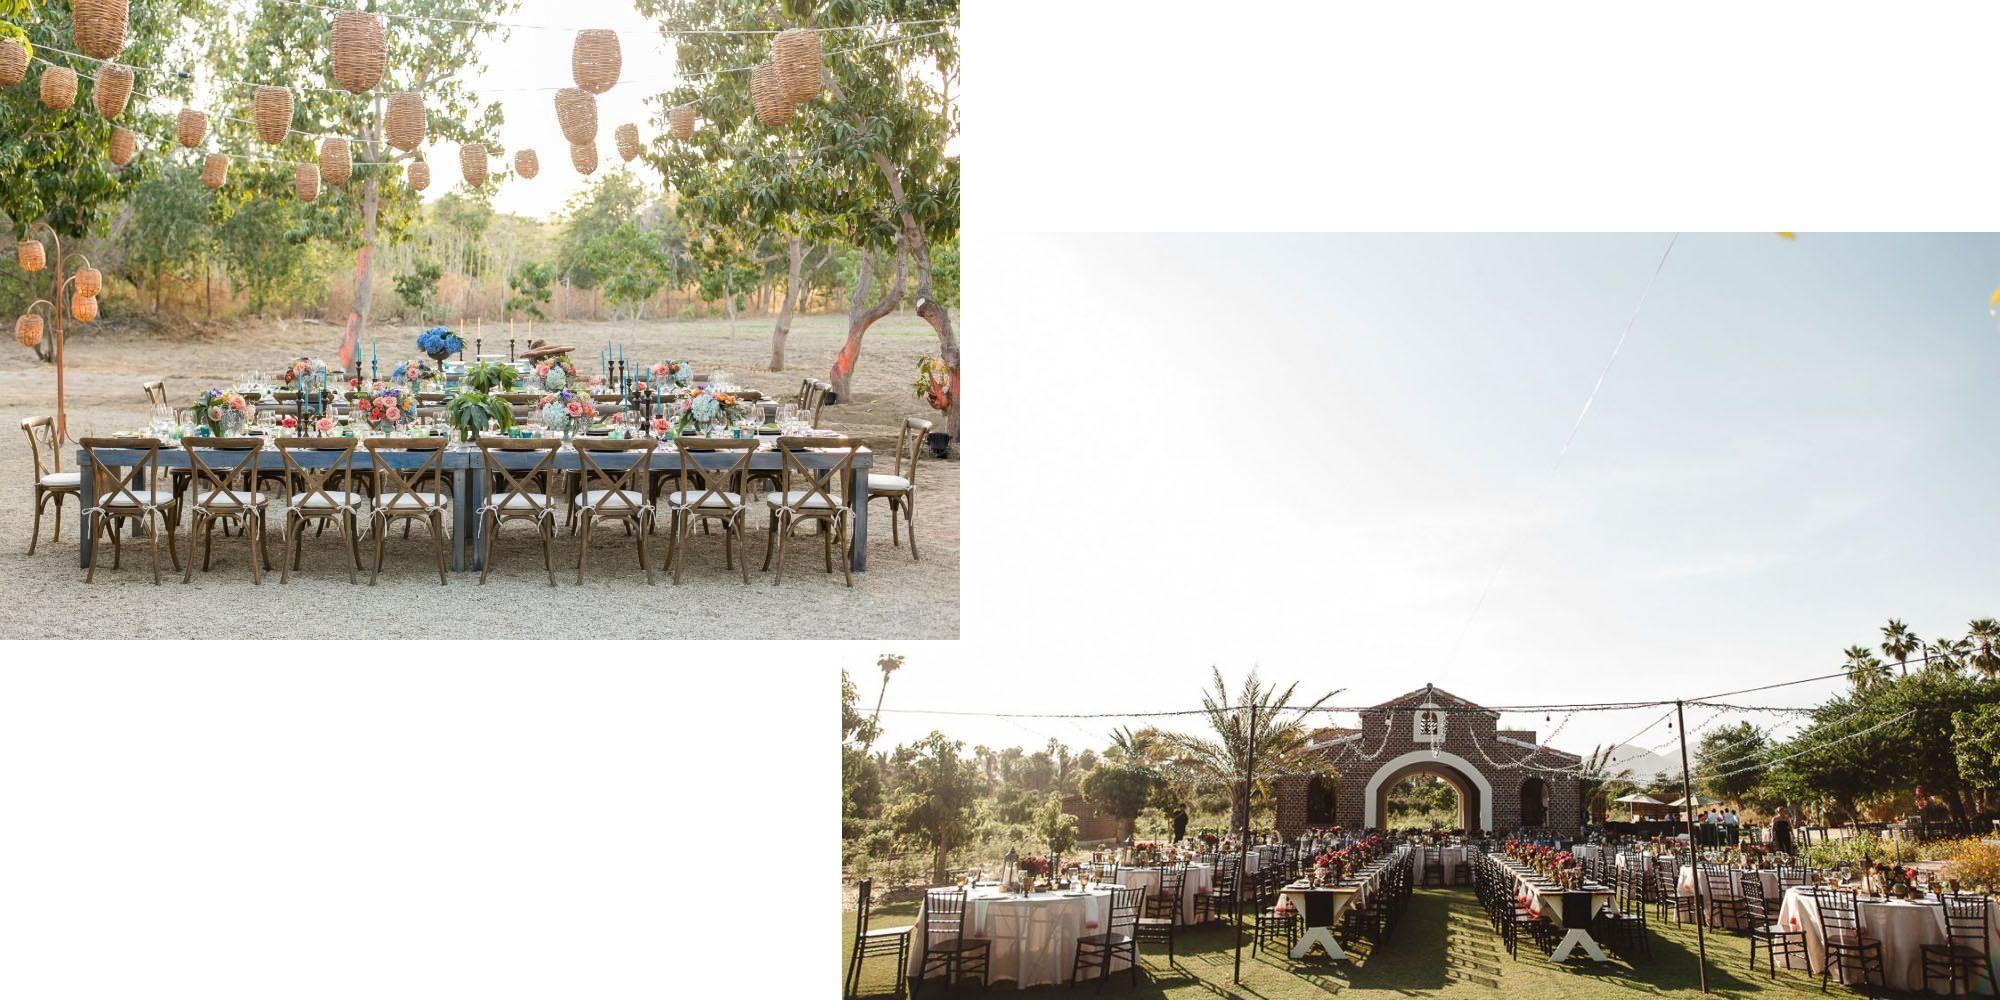 22 Best Outdoor Garden Wedding Venues - Where to Host a Garden ...